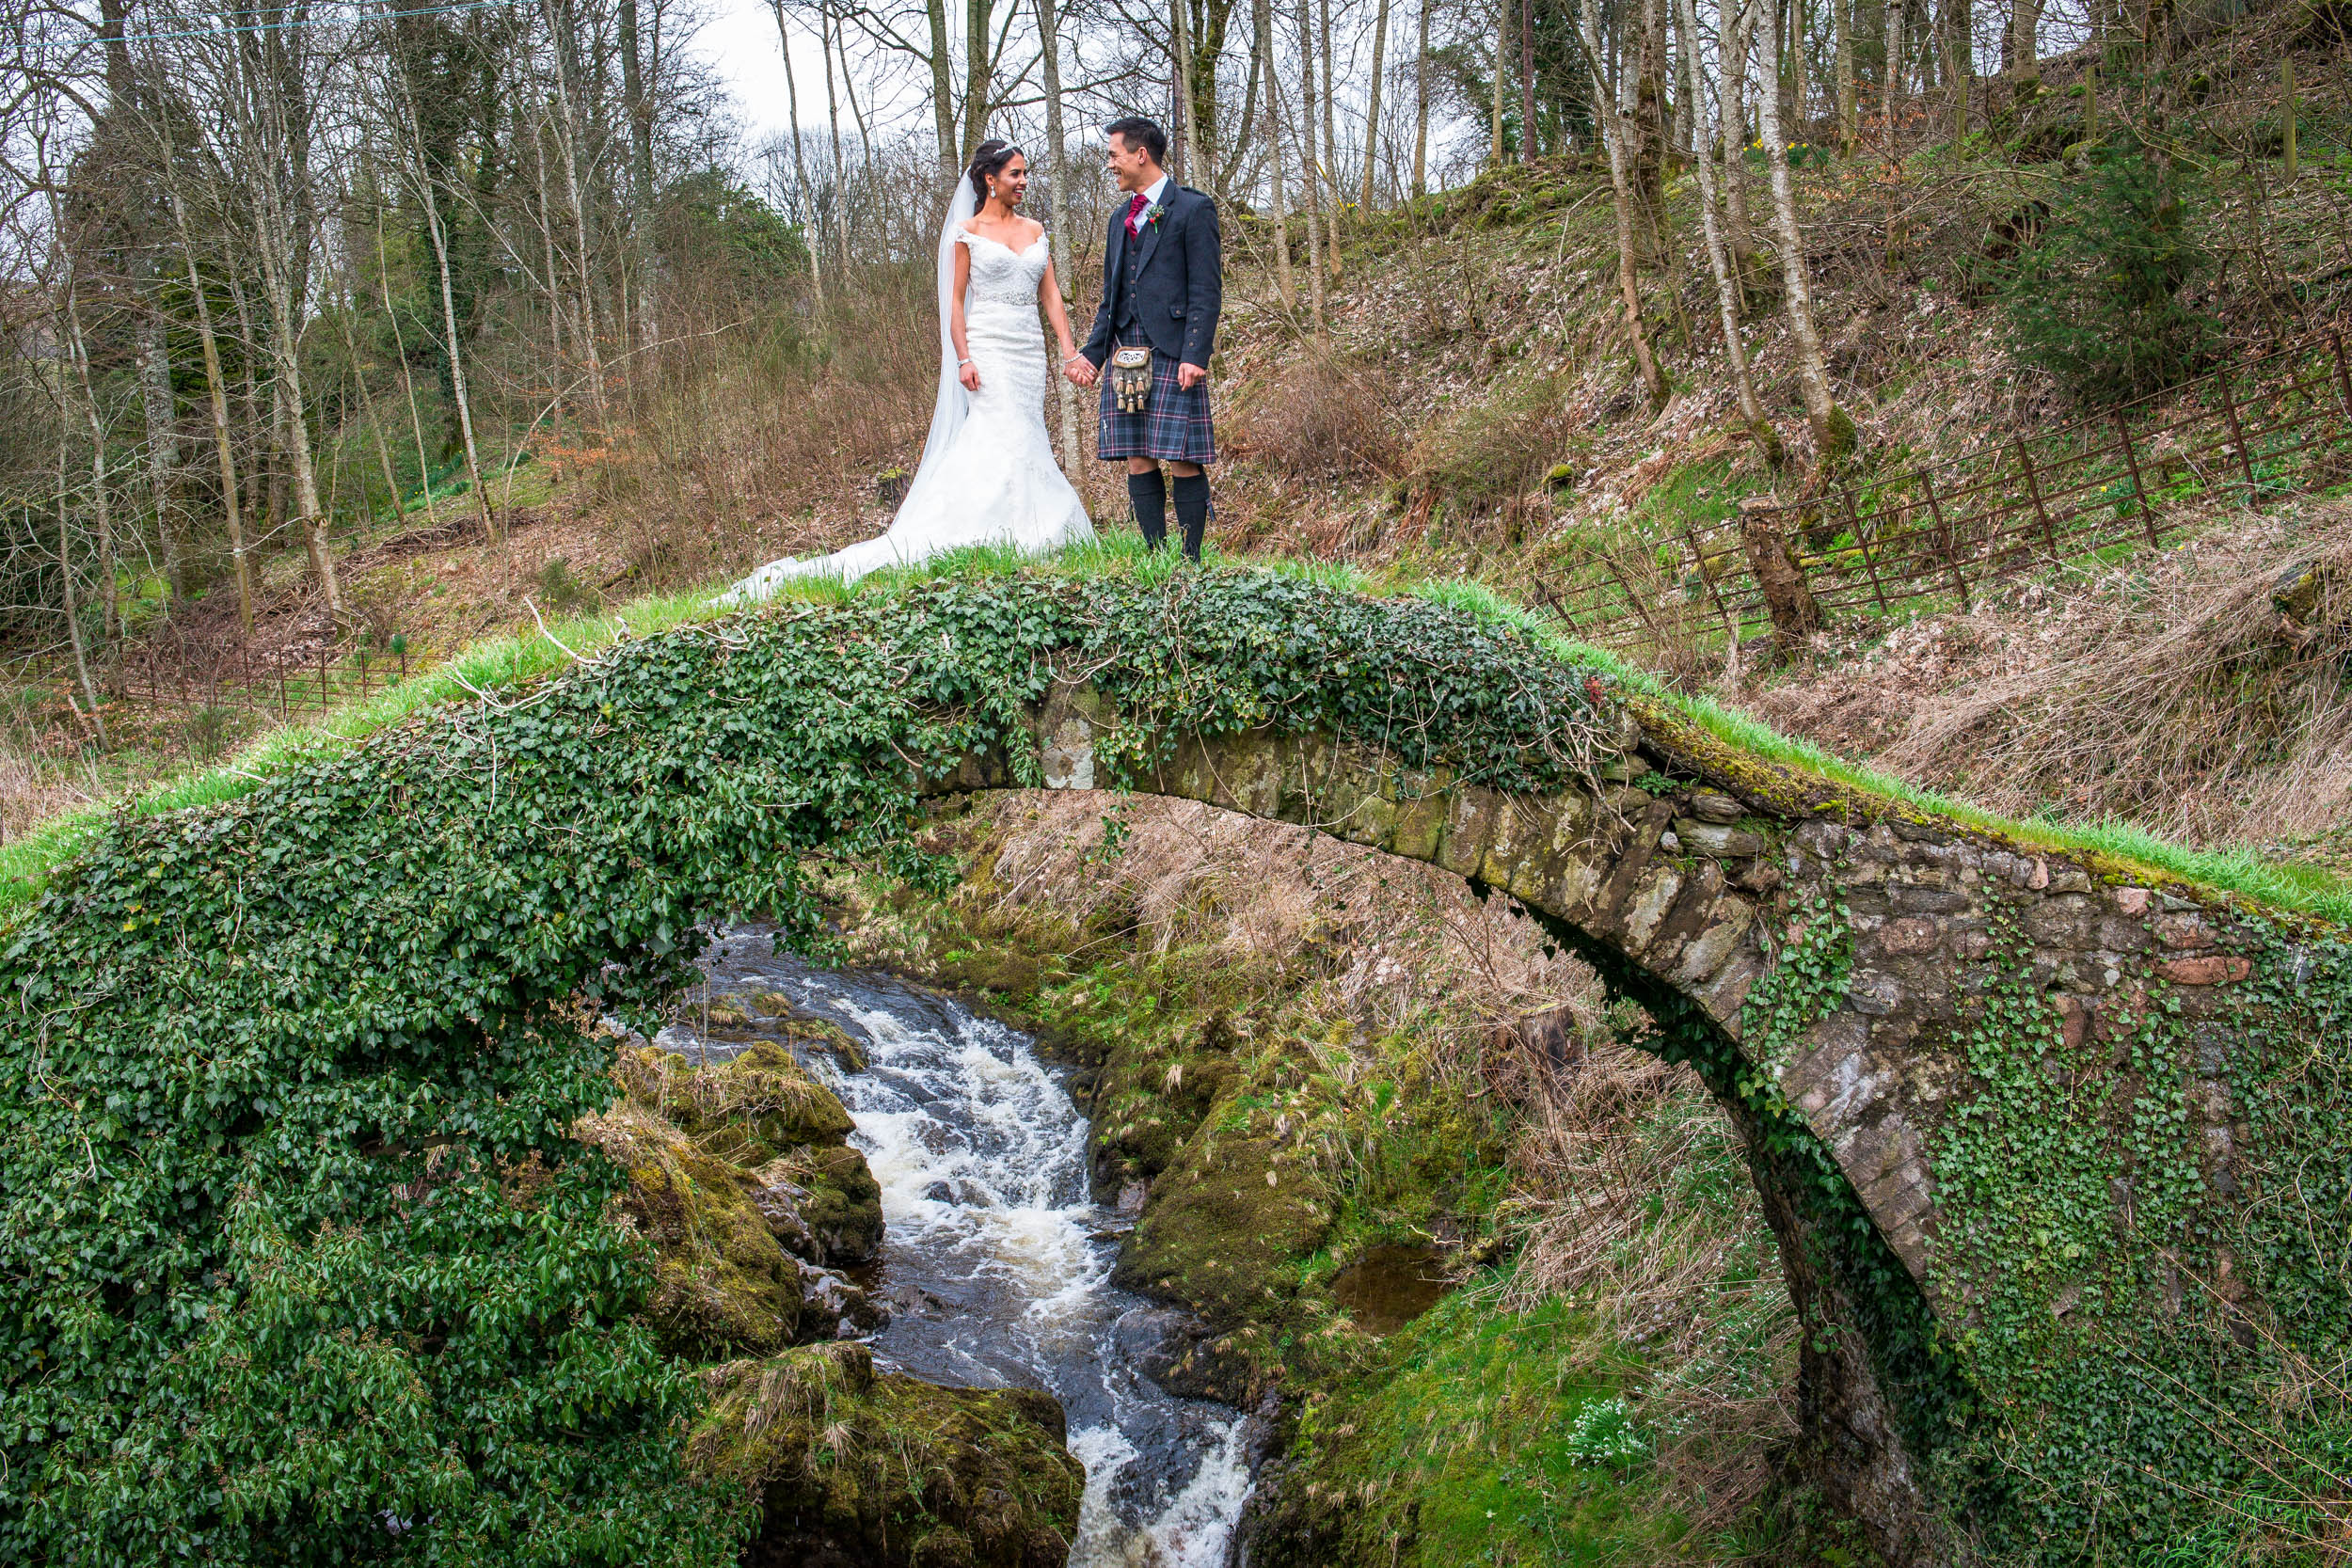 Paul-Saunders-Wedding-Photography-6376.jpg